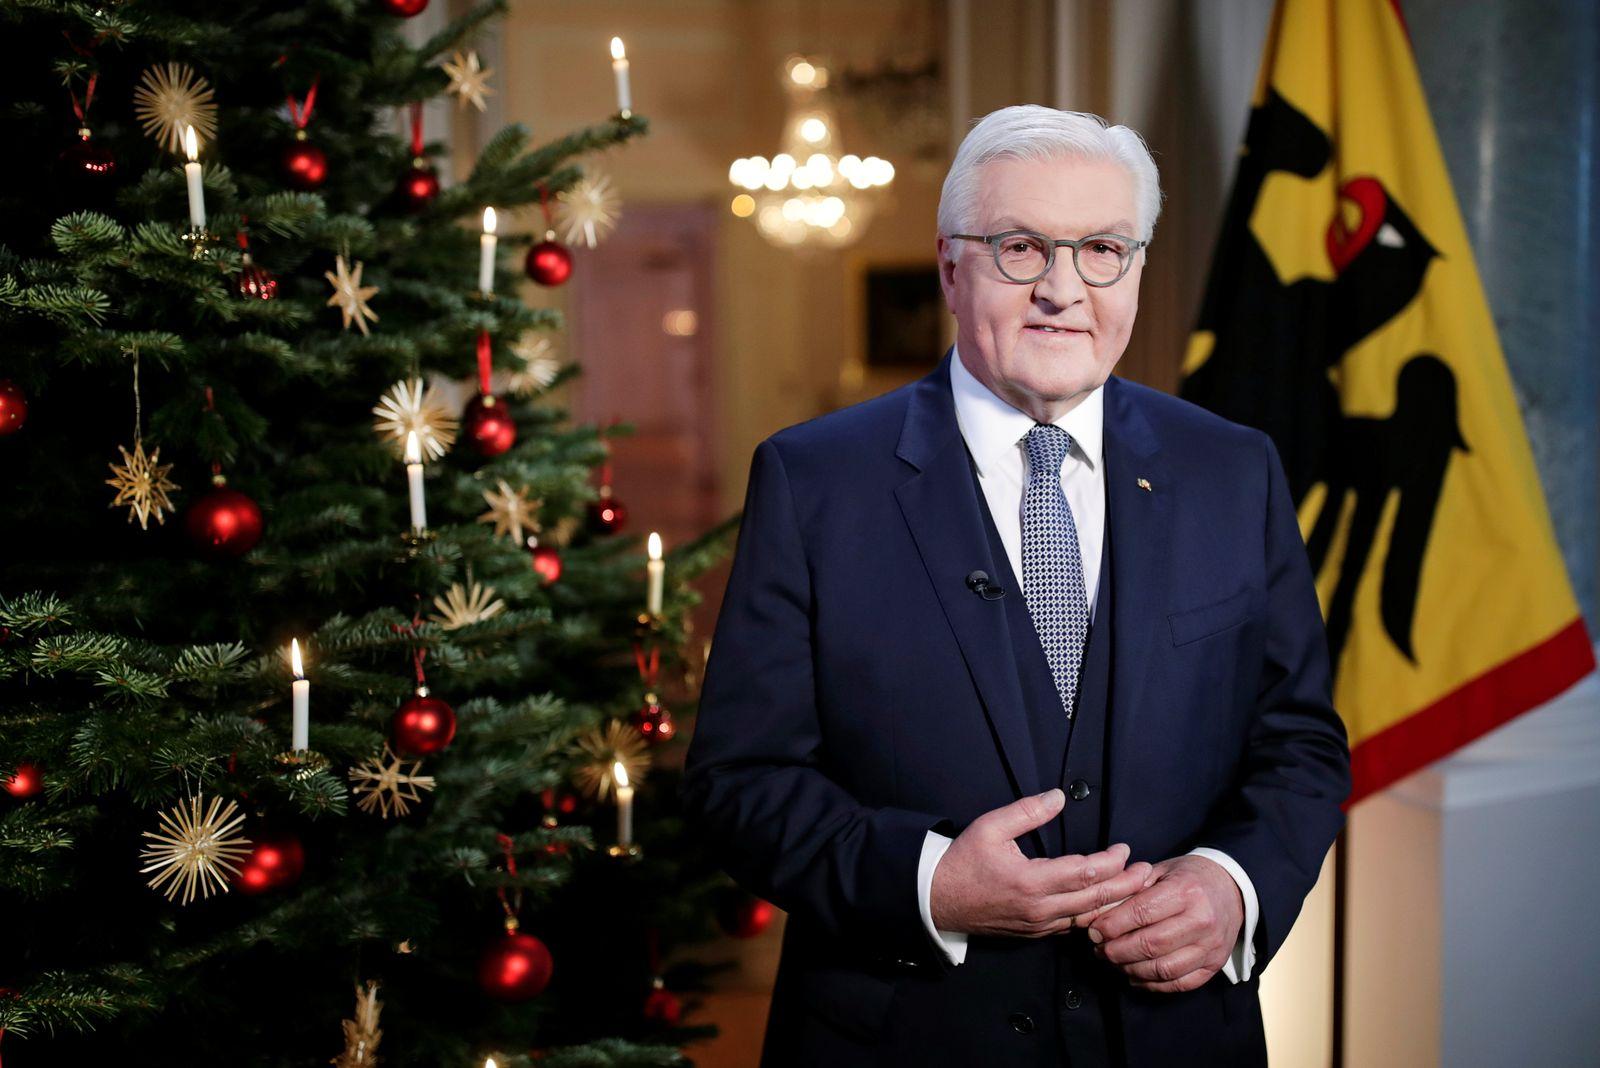 German President Steinmeier sends traditional Christmas message in Berlin